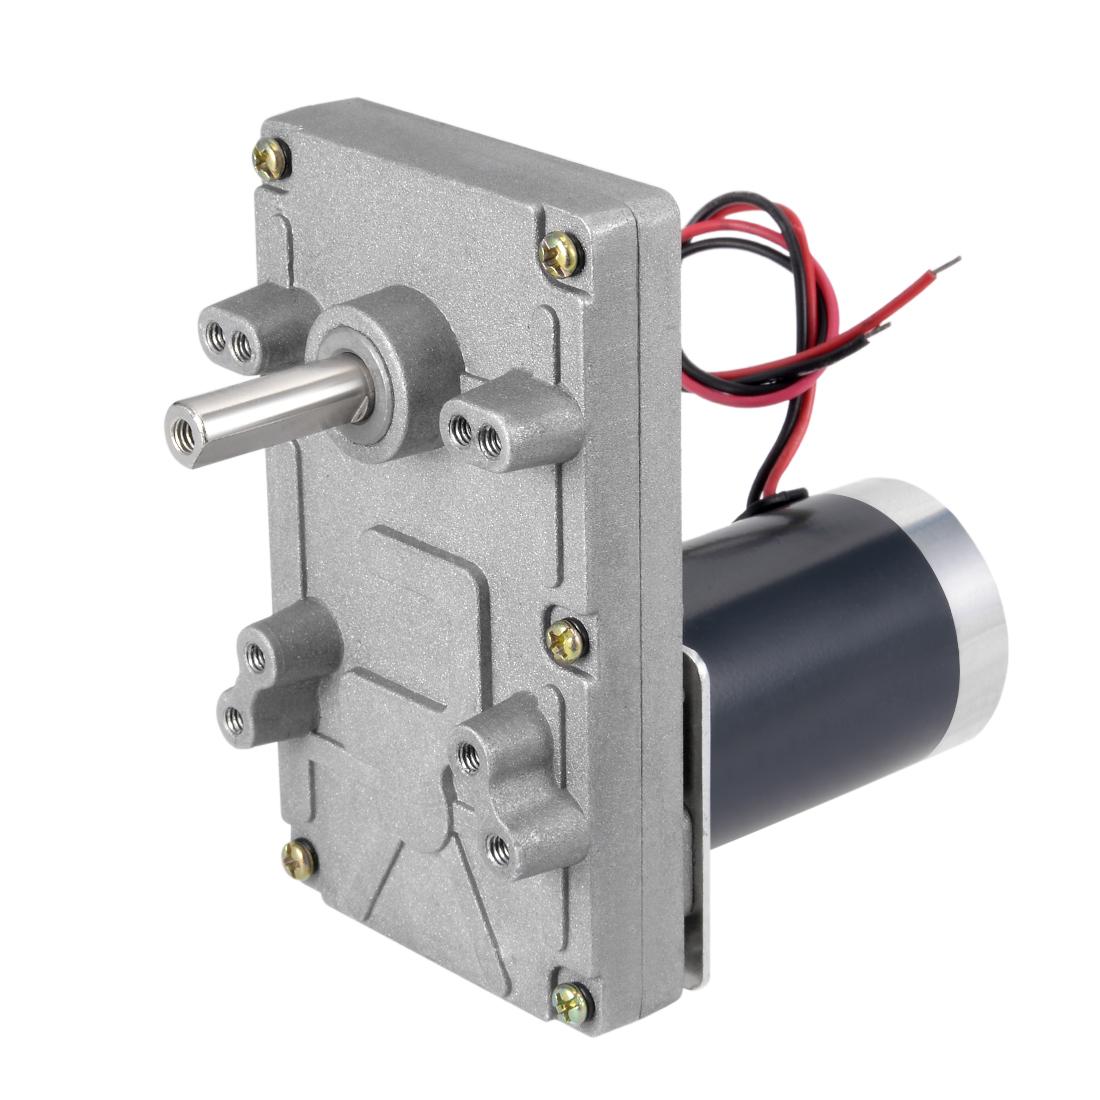 24V DC 70 RPM Gear Motor High Torque Electric Gearbox Eccentric Output Shaft